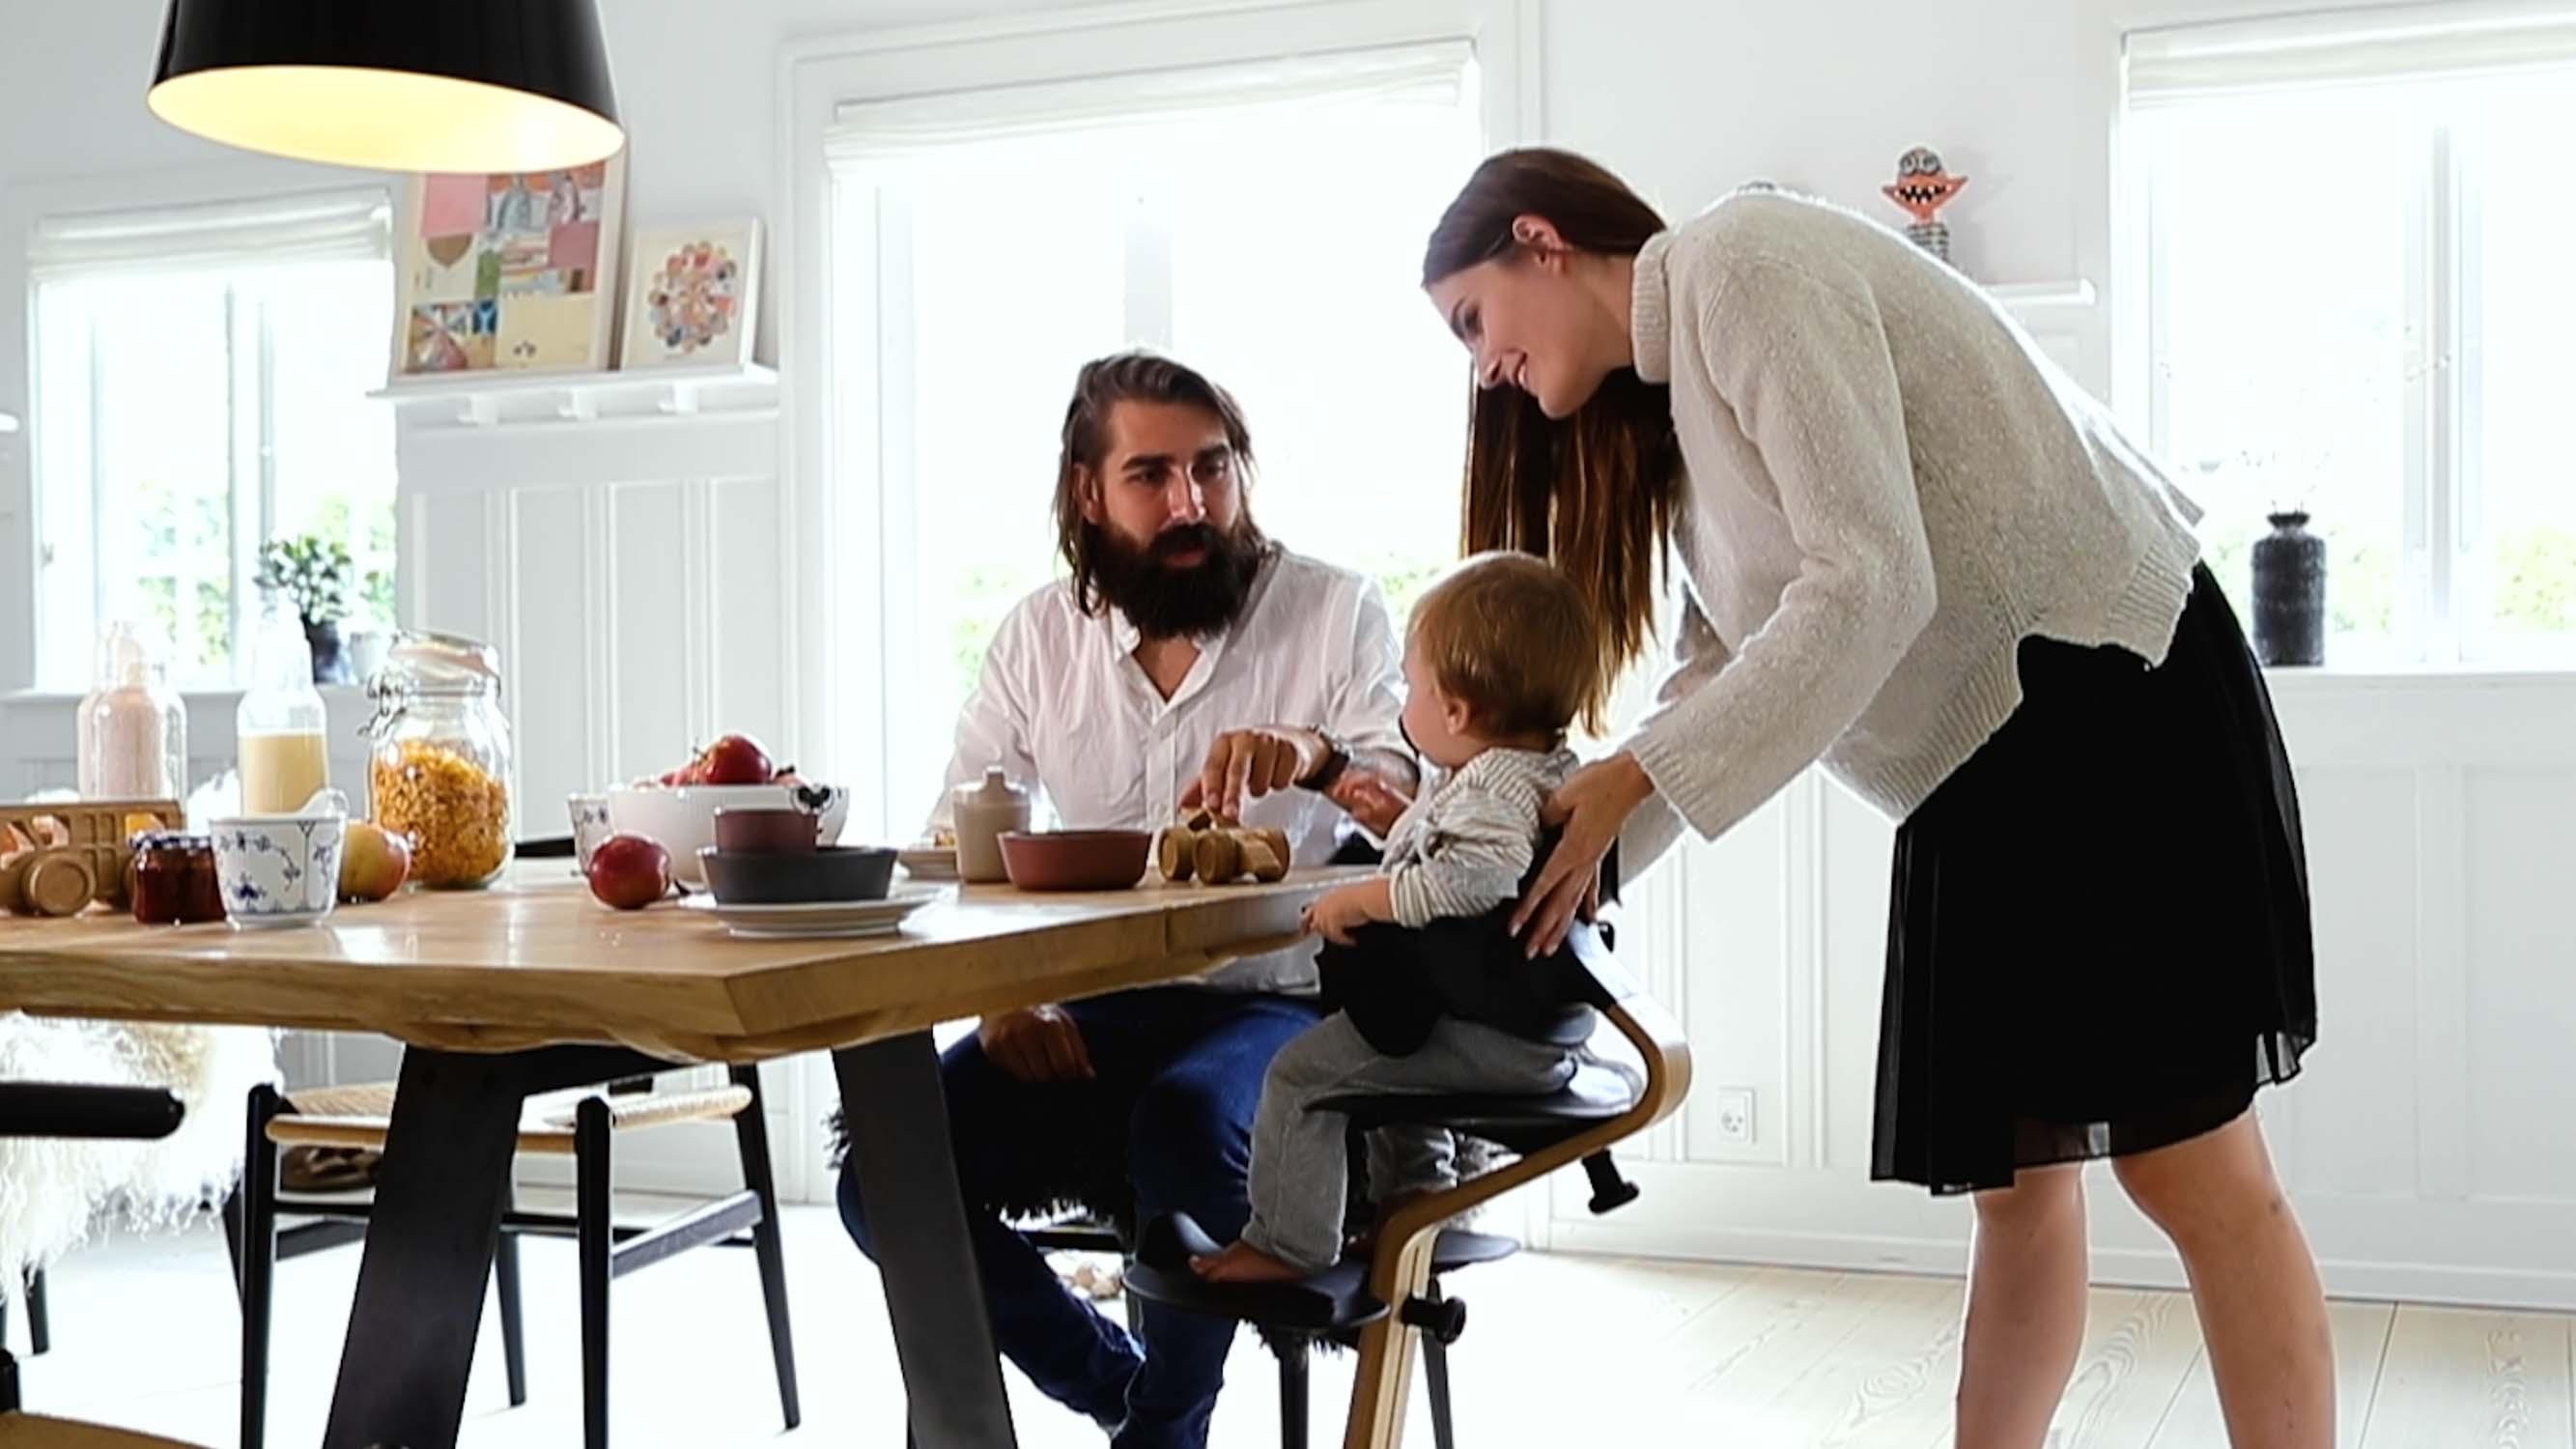 Der Nomi Mini Kann So An Den Tisch Geschoben Werden, Dass Das Kind In Den Familienalltag Integriert Wird.